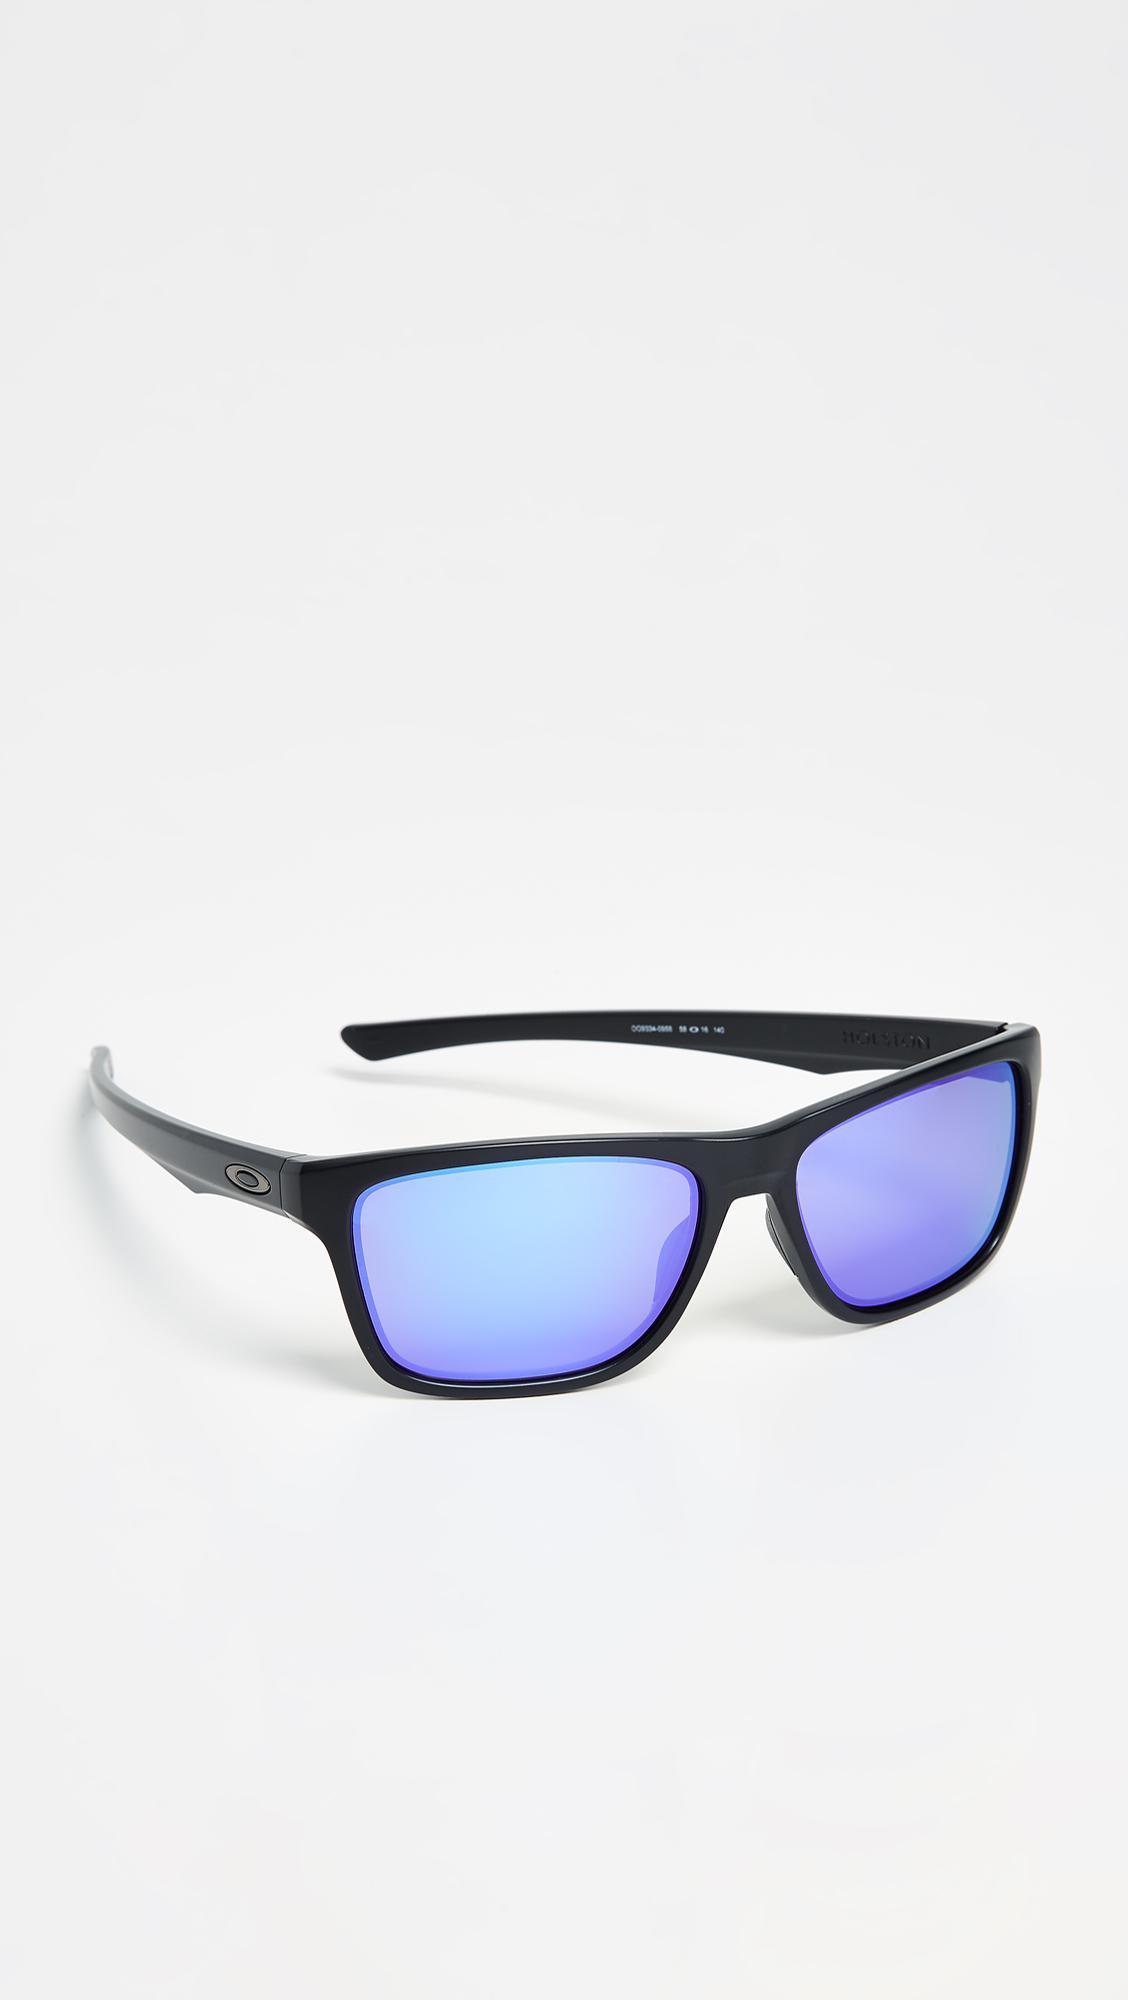 4021a06480 Oakley - Blue Holston Sunglasses for Men - Lyst. View fullscreen